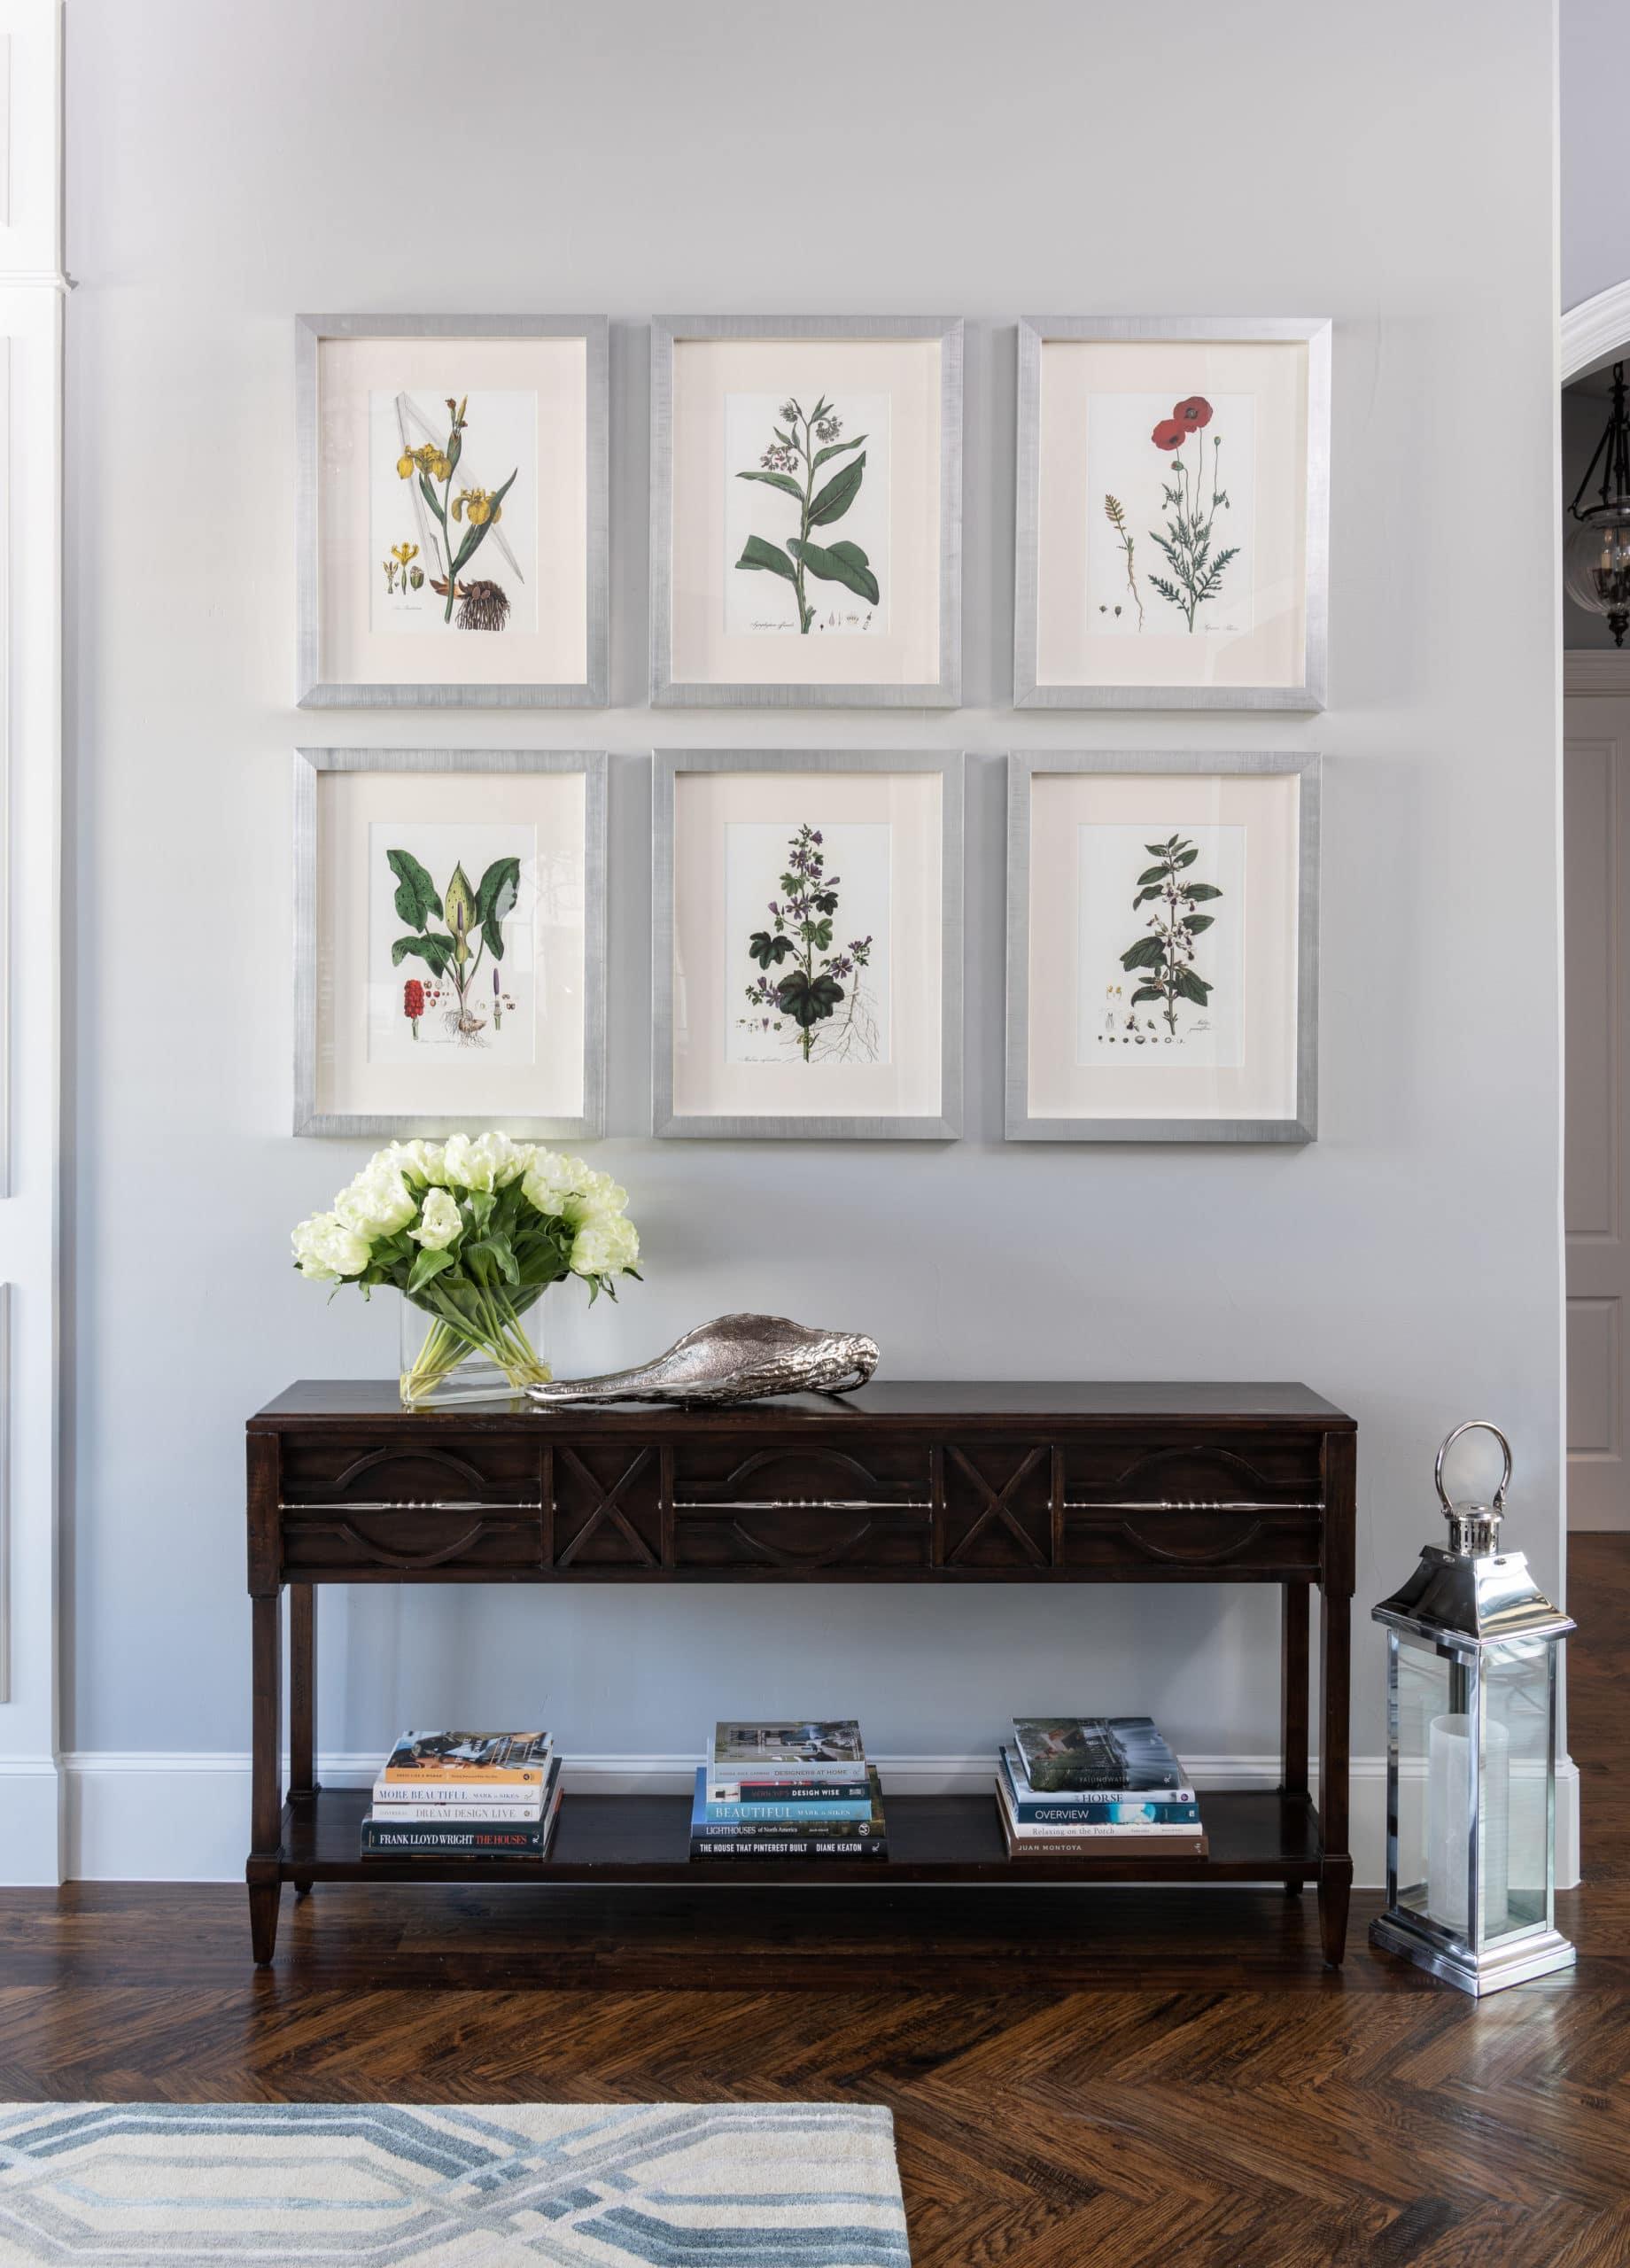 Gallery Test 3   Award-Winning Interior Designers, Interior Decorators, Kitchen Designers, Bath Designers, Home Renovations, Window Treatments, & Custom Furniture D'KOR HOME by Dee Frazier Interiors   Interior Designer Dallas TX